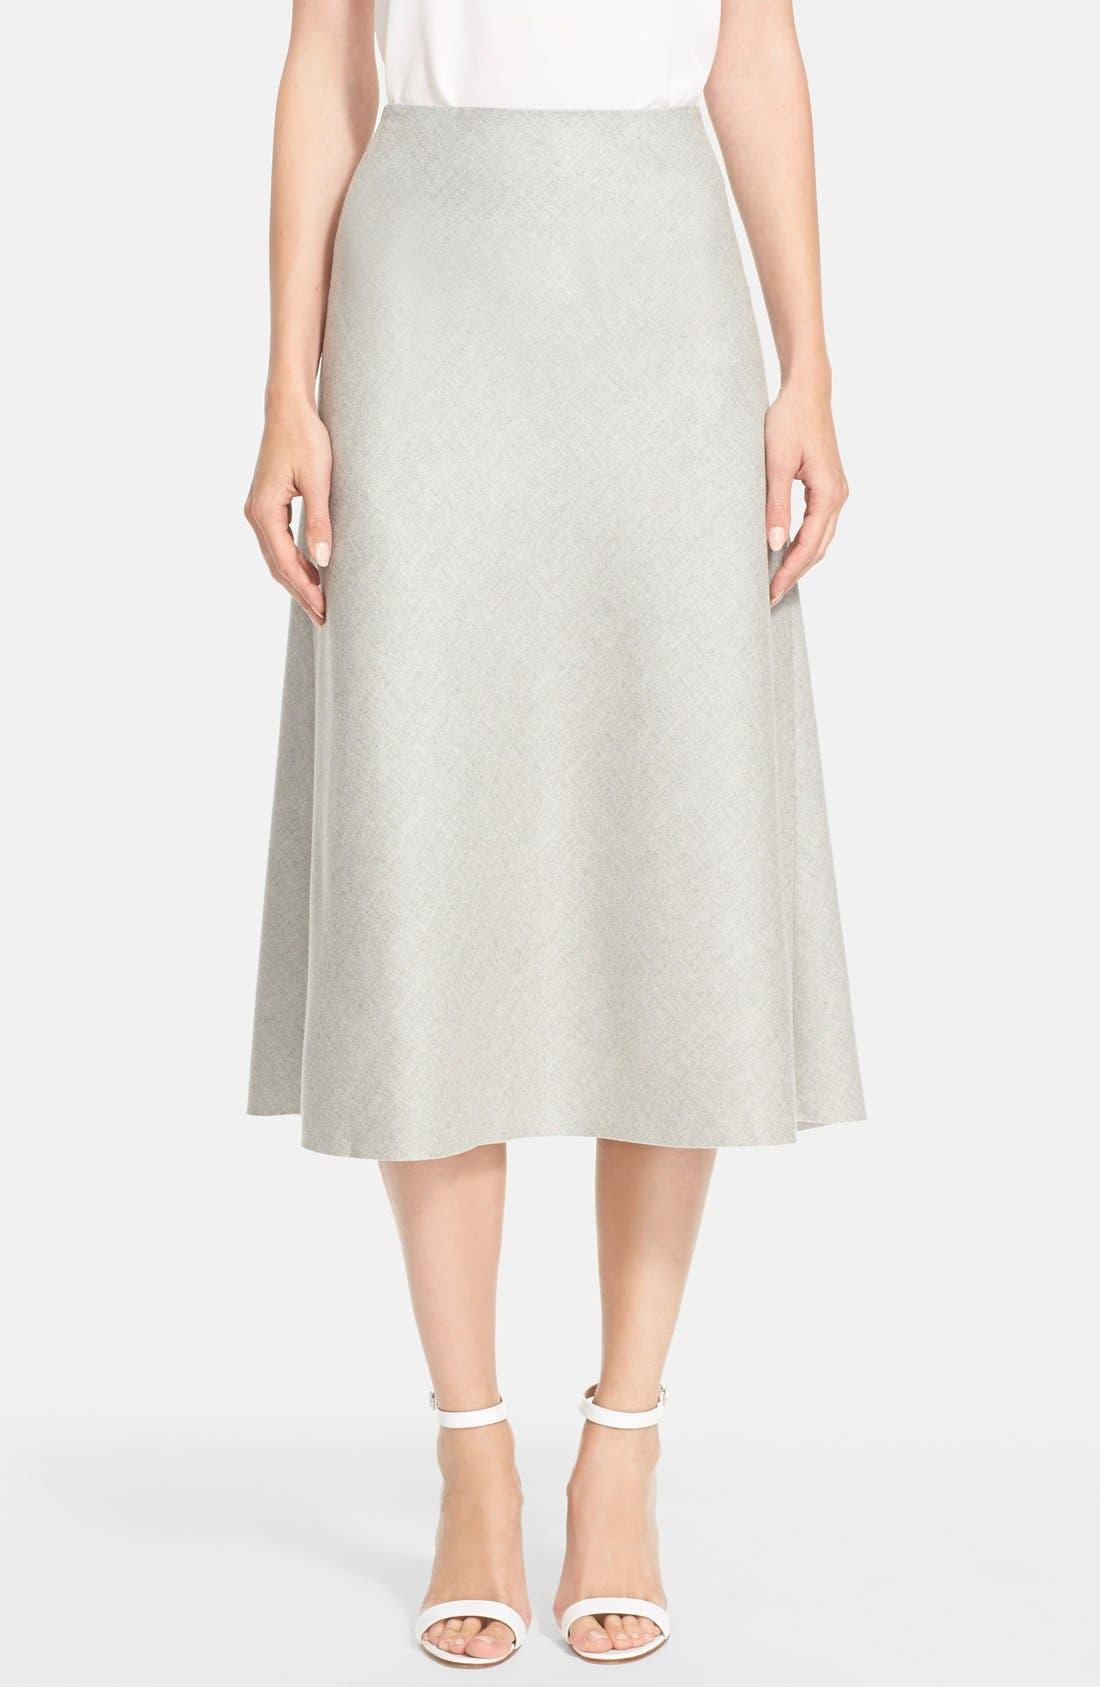 'Jahneem' Flannel Skirt,                         Main,                         color, 050